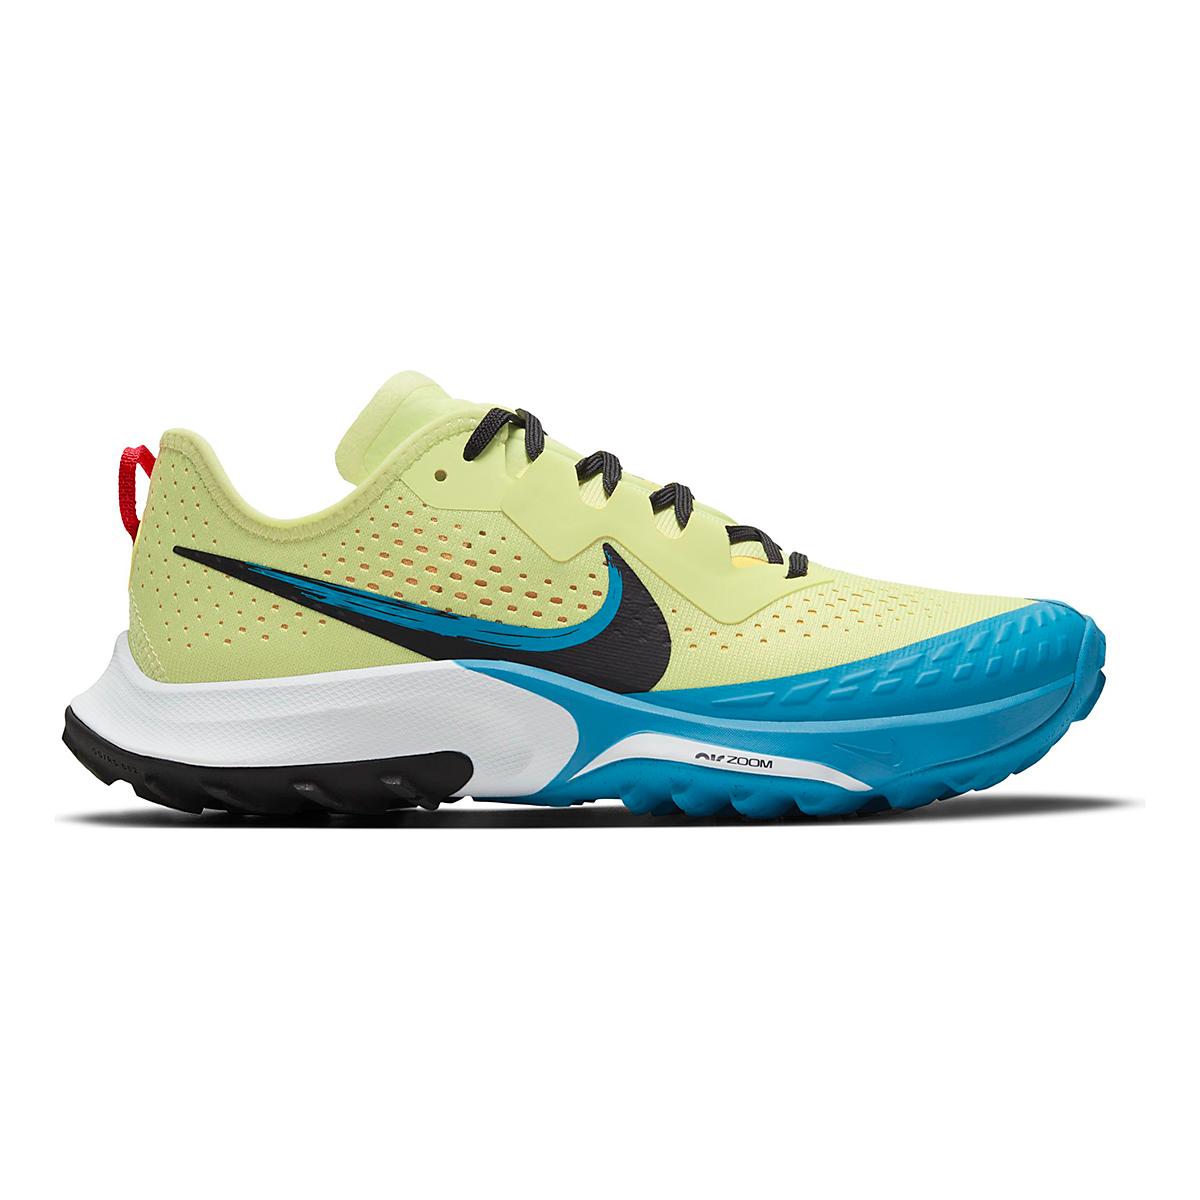 Women's Nike Air Zoom Terra Kiger 7 Trail Running Shoe - Color: Limelight/Off Noir/Laser Blue - Size: 5 - Width: Regular, Limelight/Off Noir/Laser Blue, large, image 1